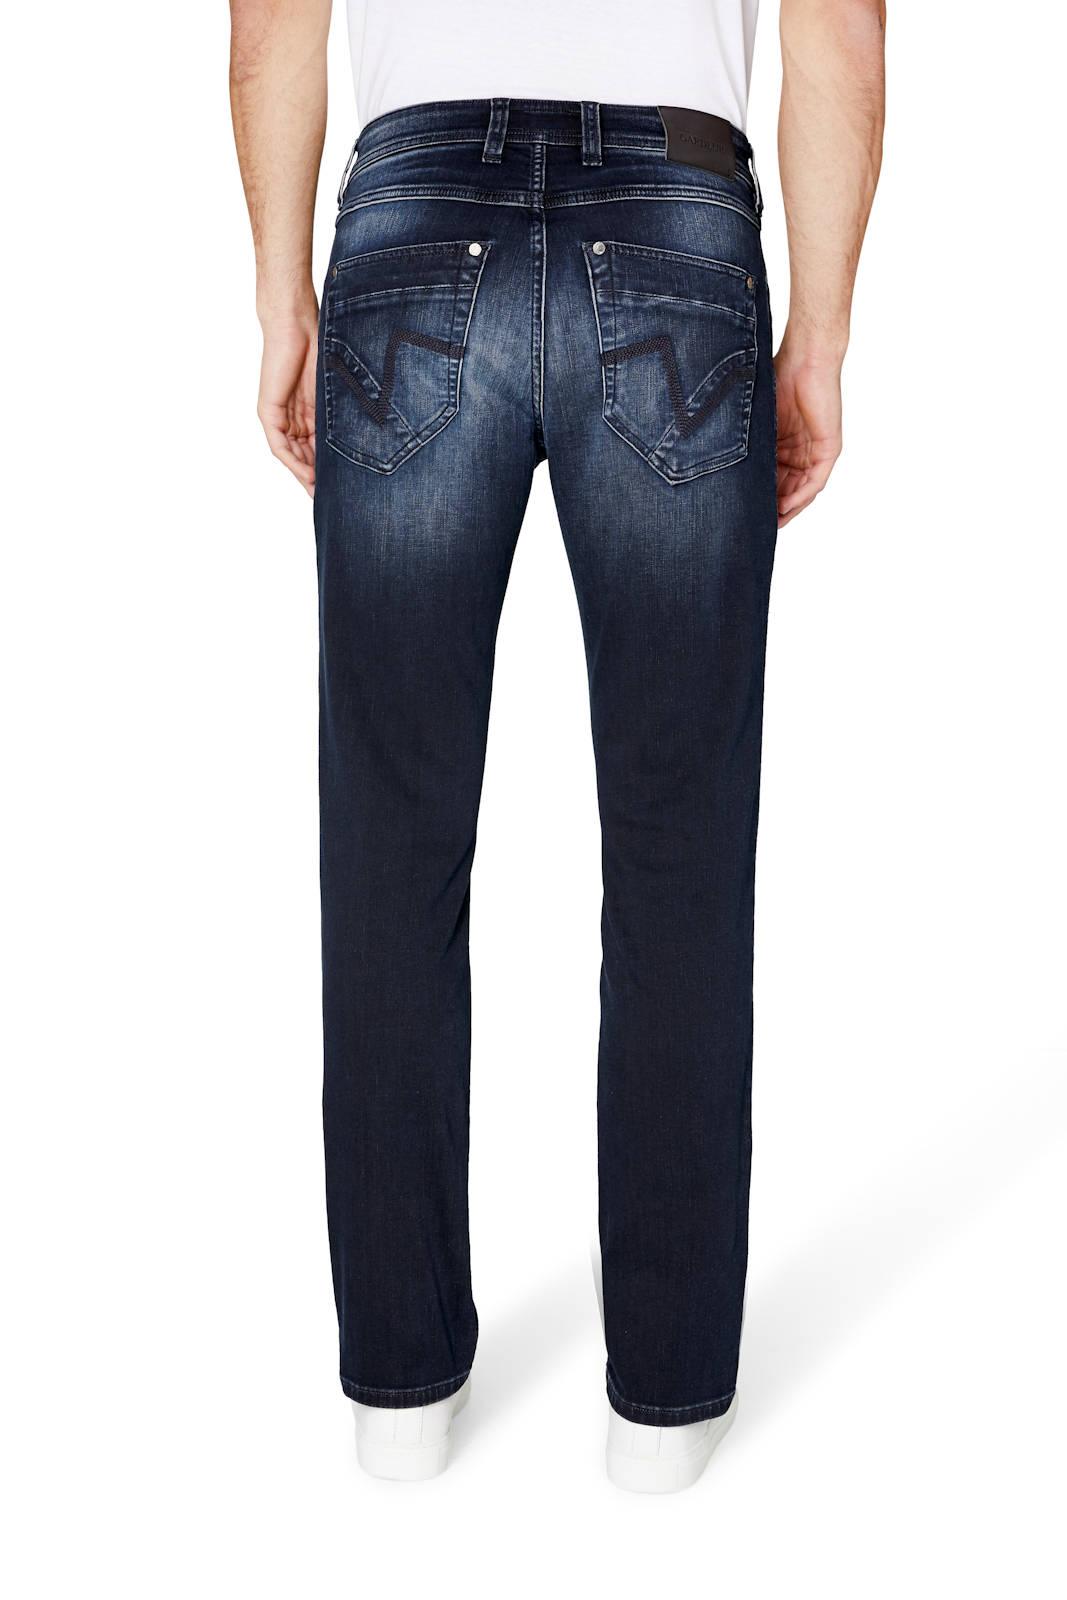 Atelier-GARDEUR-Jeans-BILL-8-Modern-Fit-Herren-Hose-Slim-Leg-Denim-NEU Indexbild 12